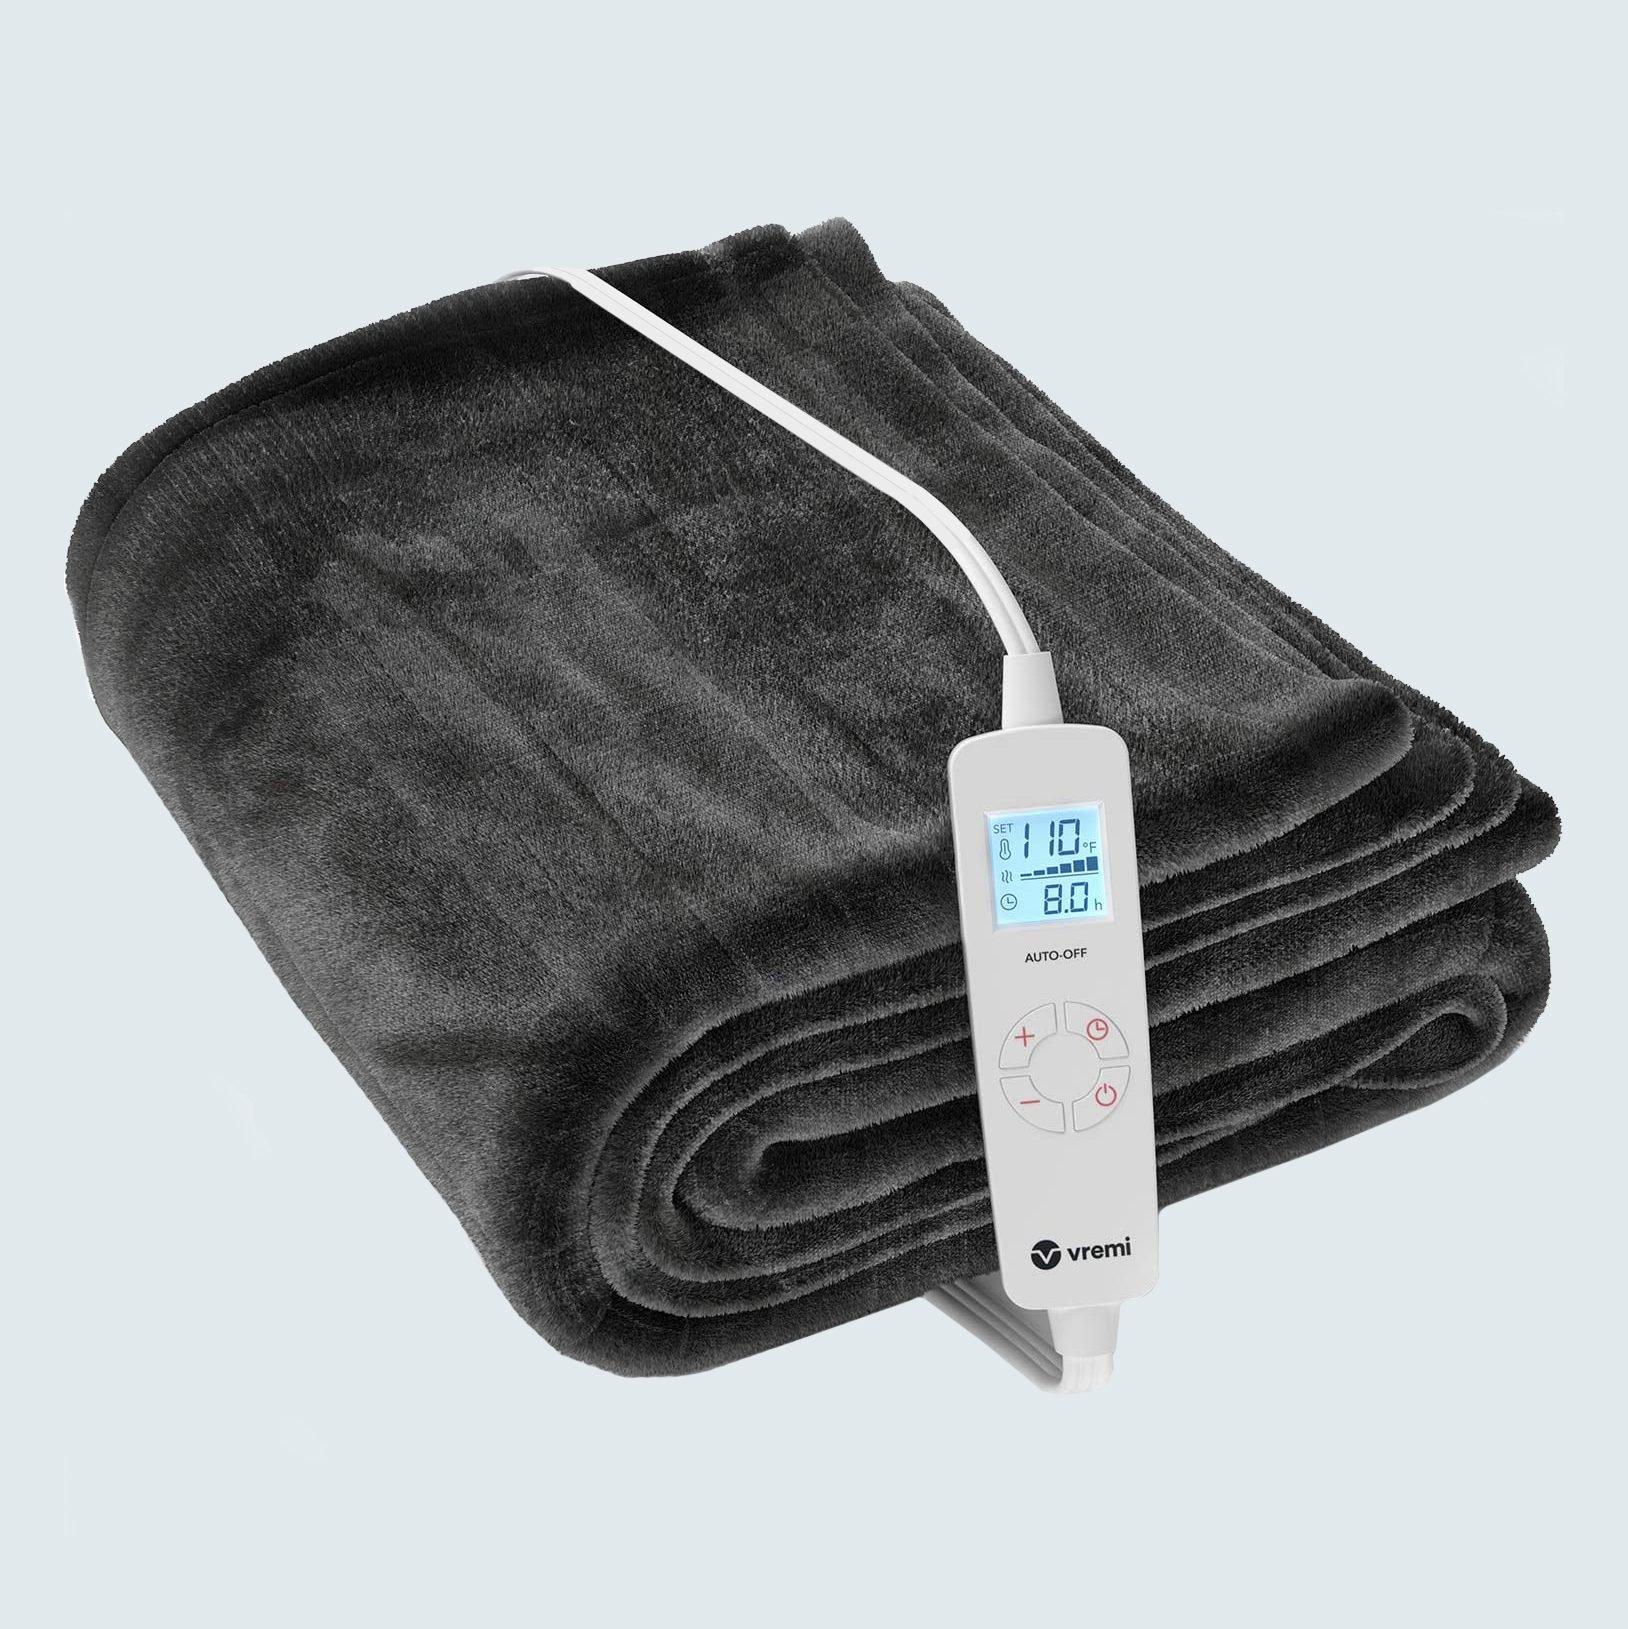 heated blanket on grey background